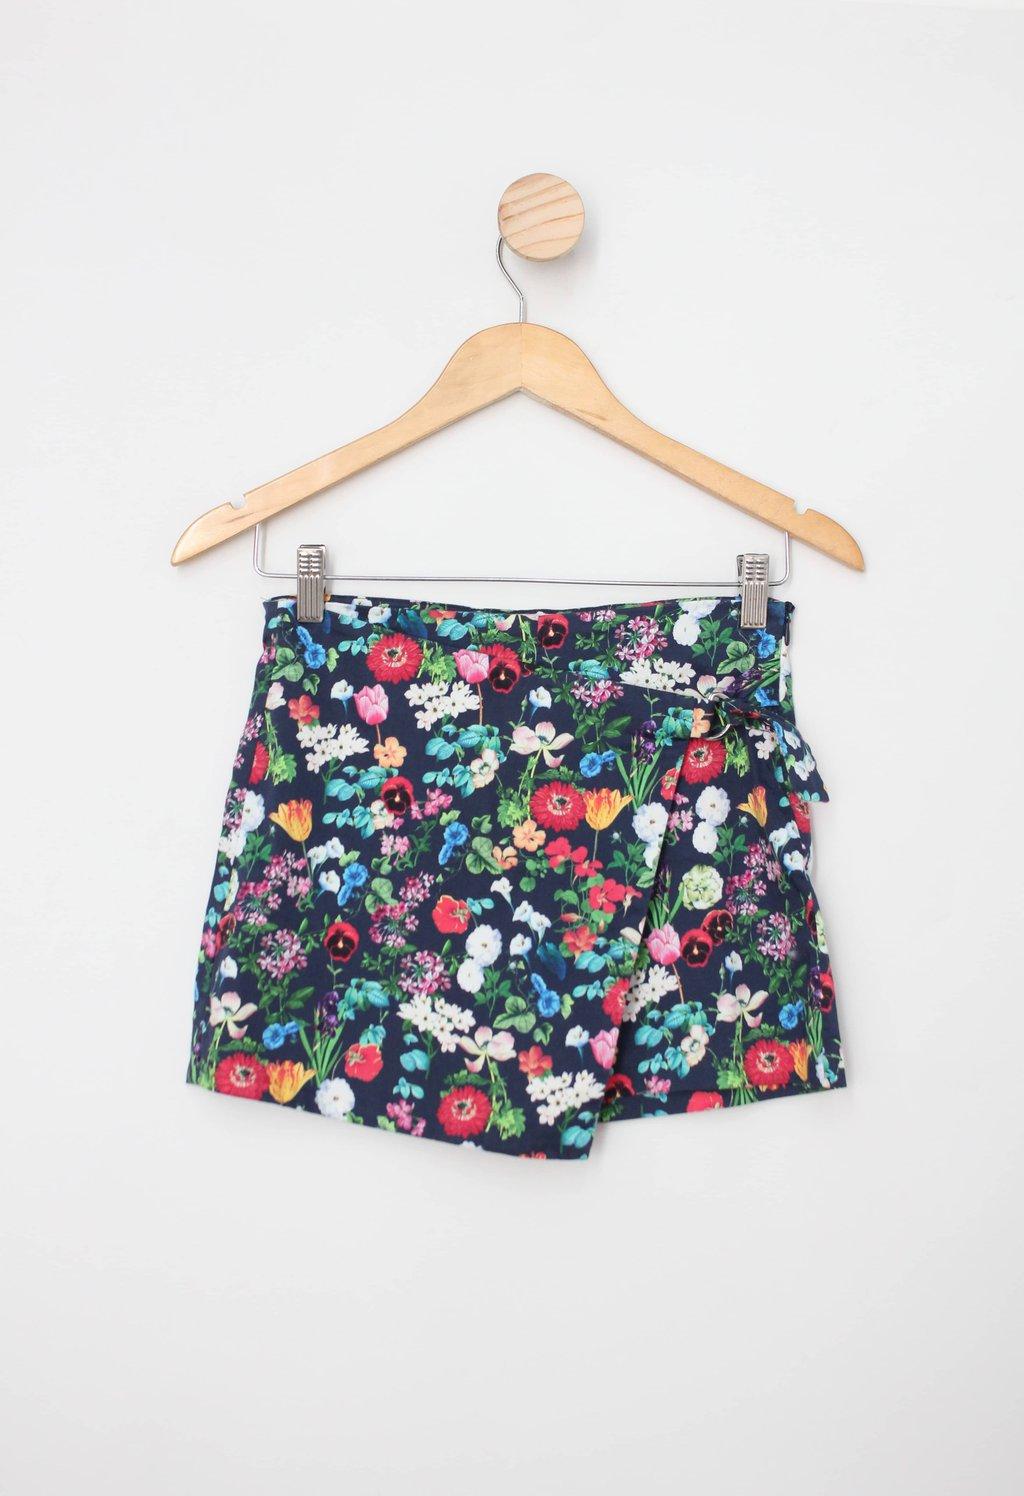 Shorts-saia Infantil zara azul floral